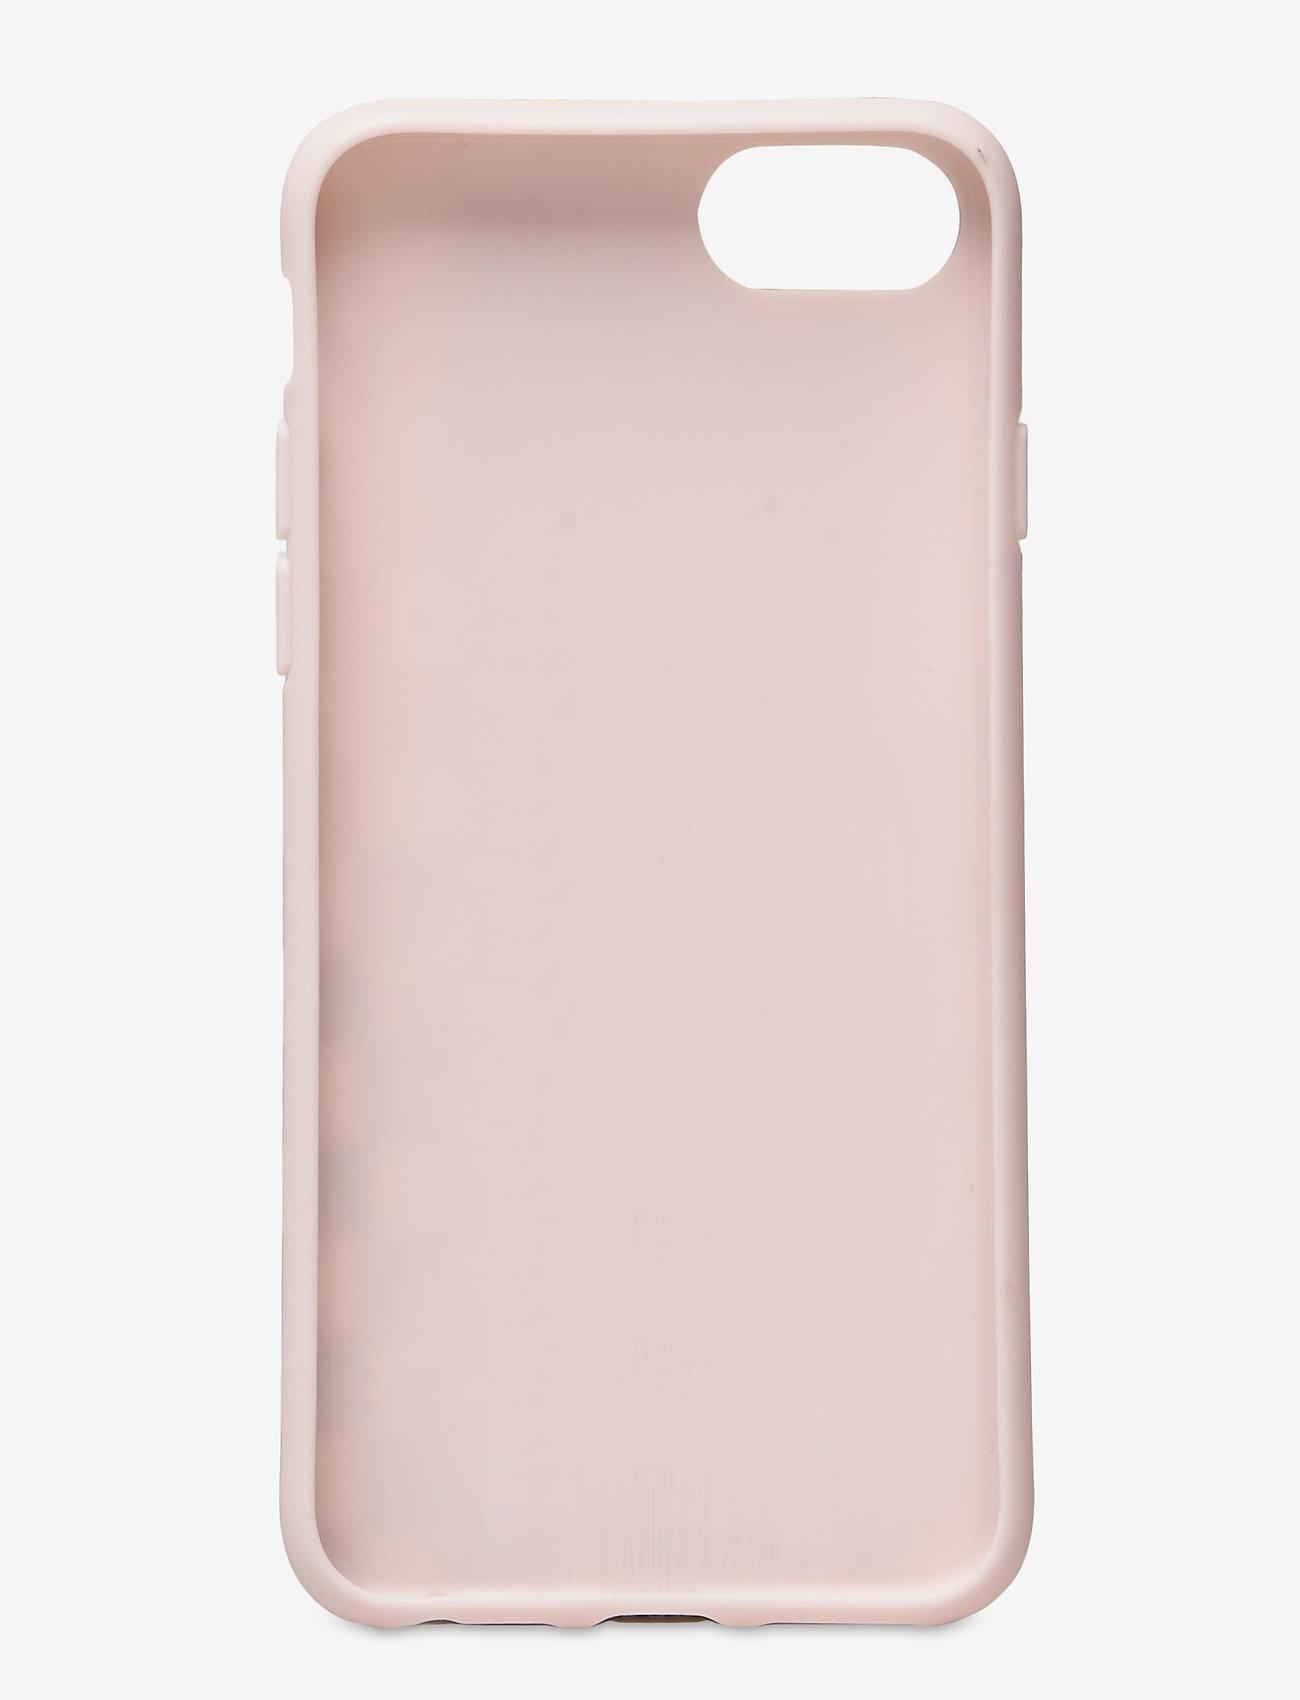 STINE GOYA - Molly, Iphone Cover 6/7/8 - mobilskal - checks - 1